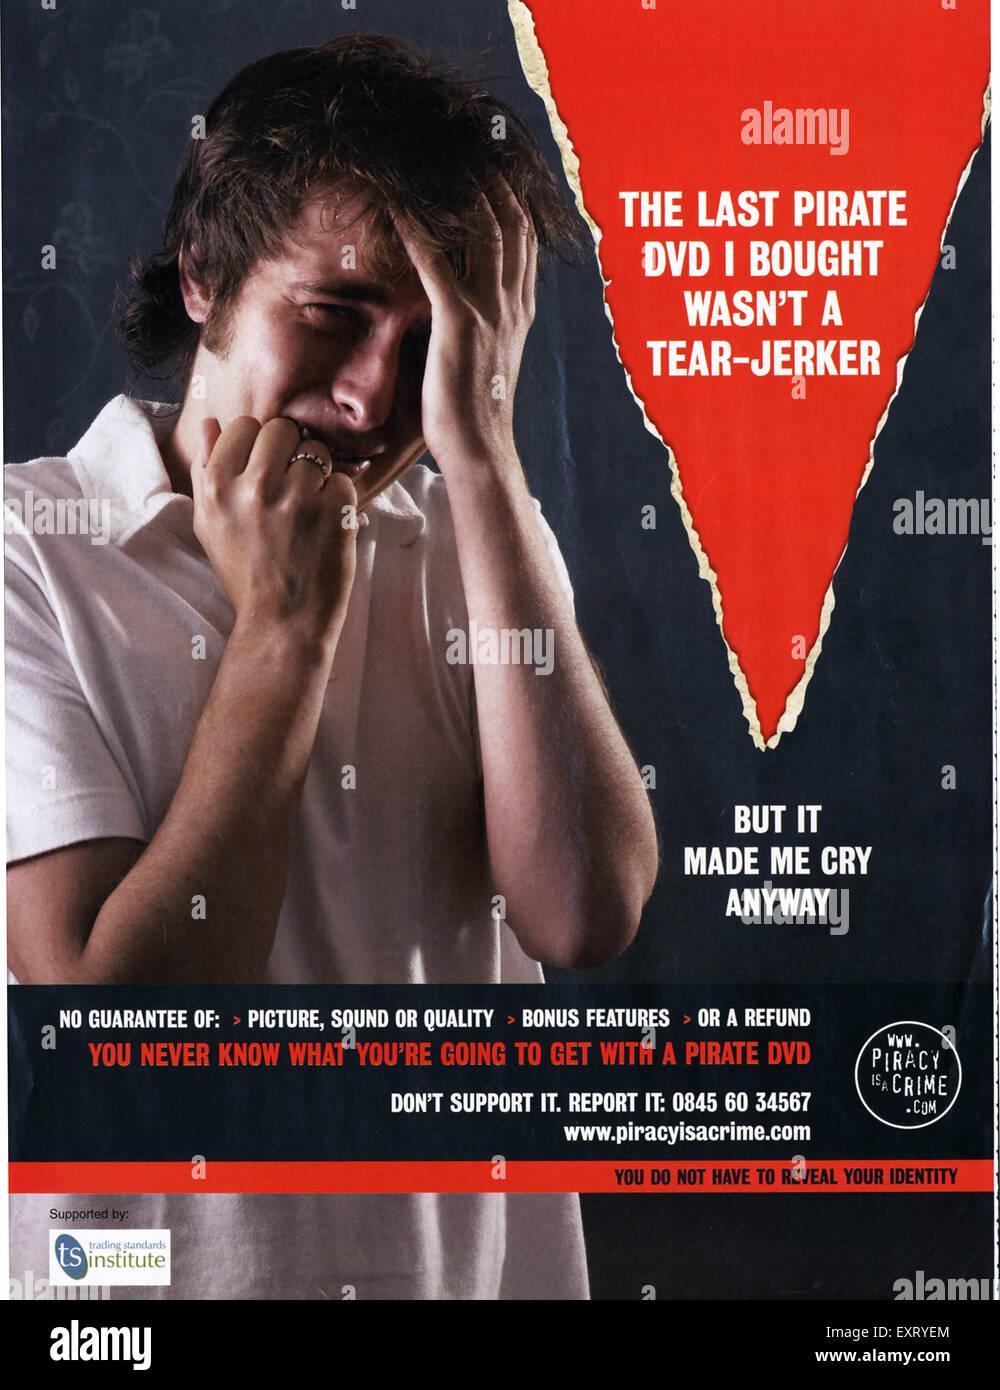 2000s UK Piracy is a Crime Magazine Advert - Stock Image